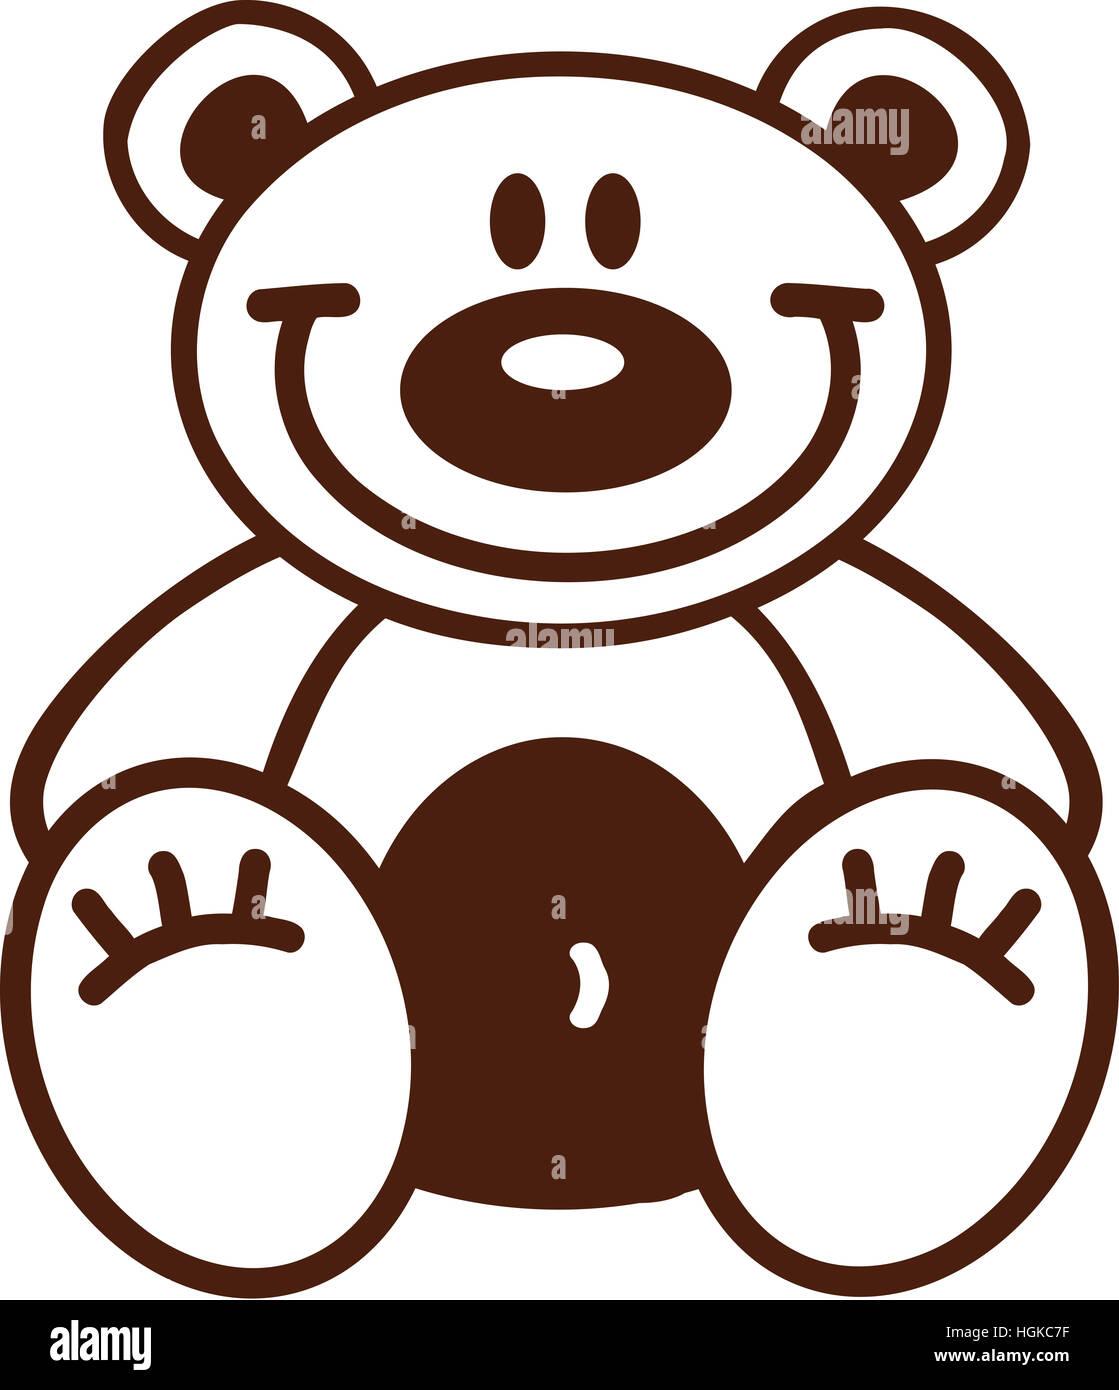 Cartoon teddy bear outline Stock Photo Royalty Free Image